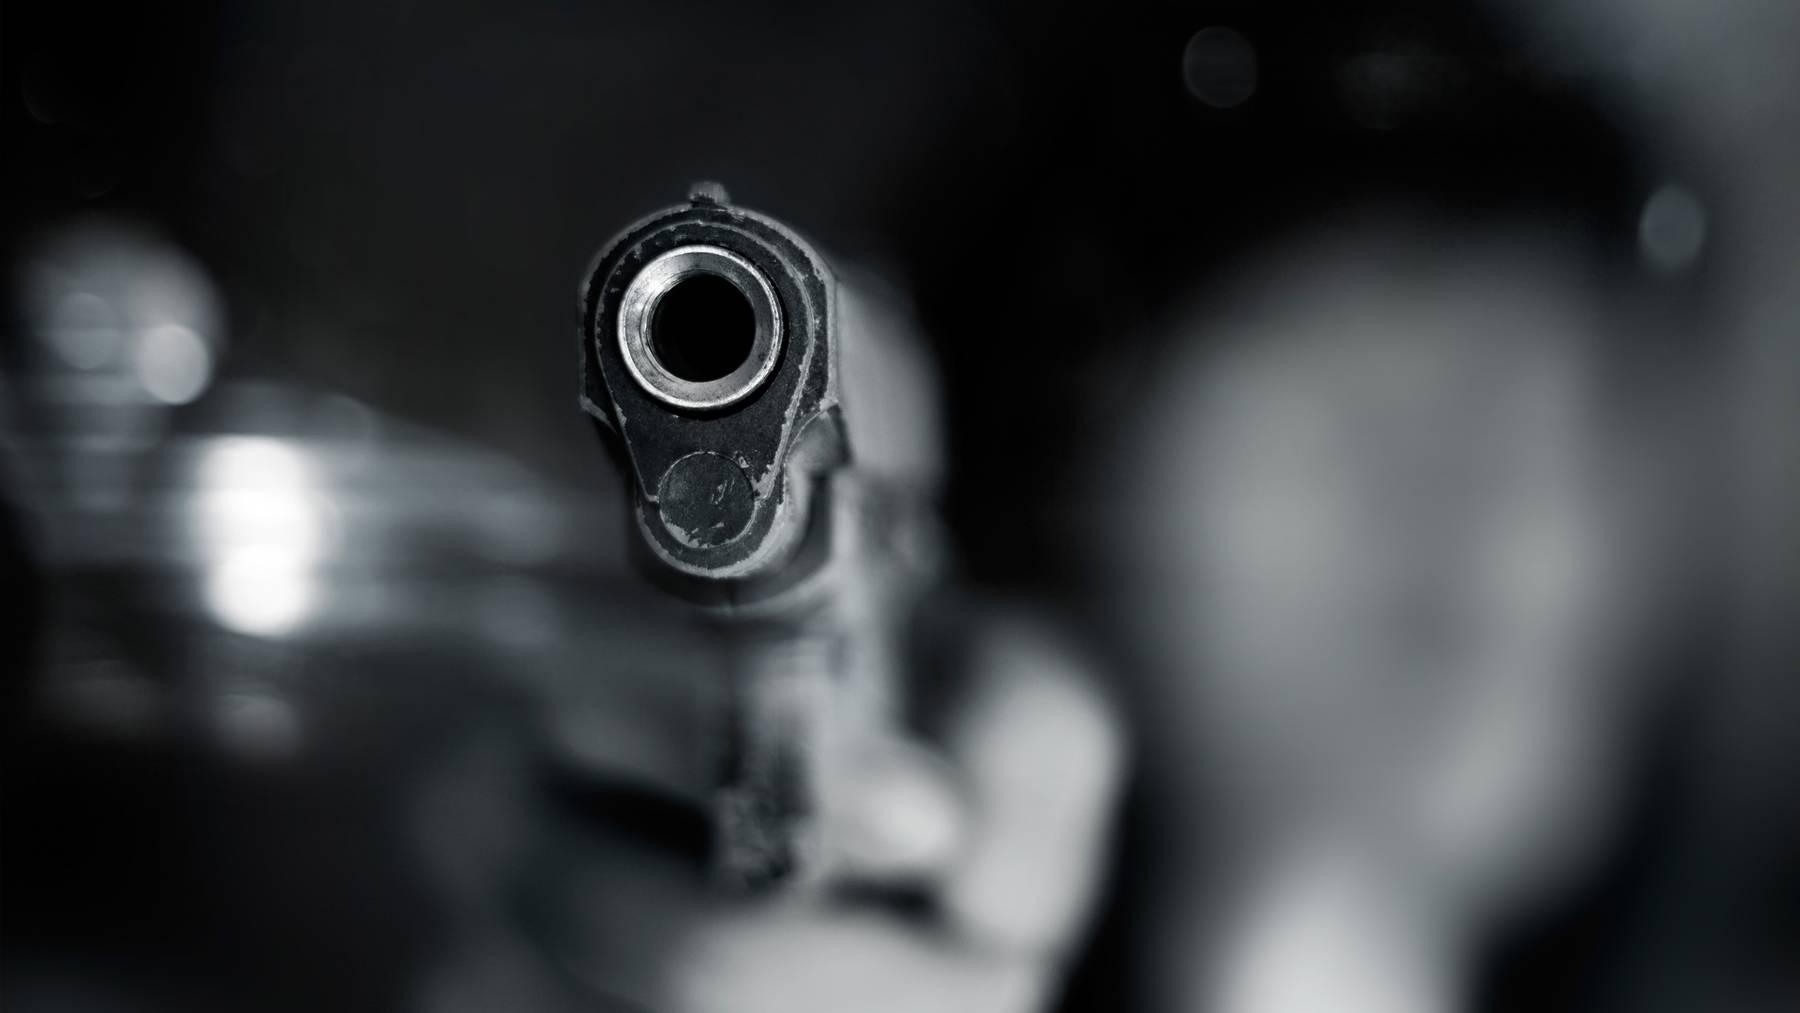 Pistole Waffe Schüsse Symbolbild